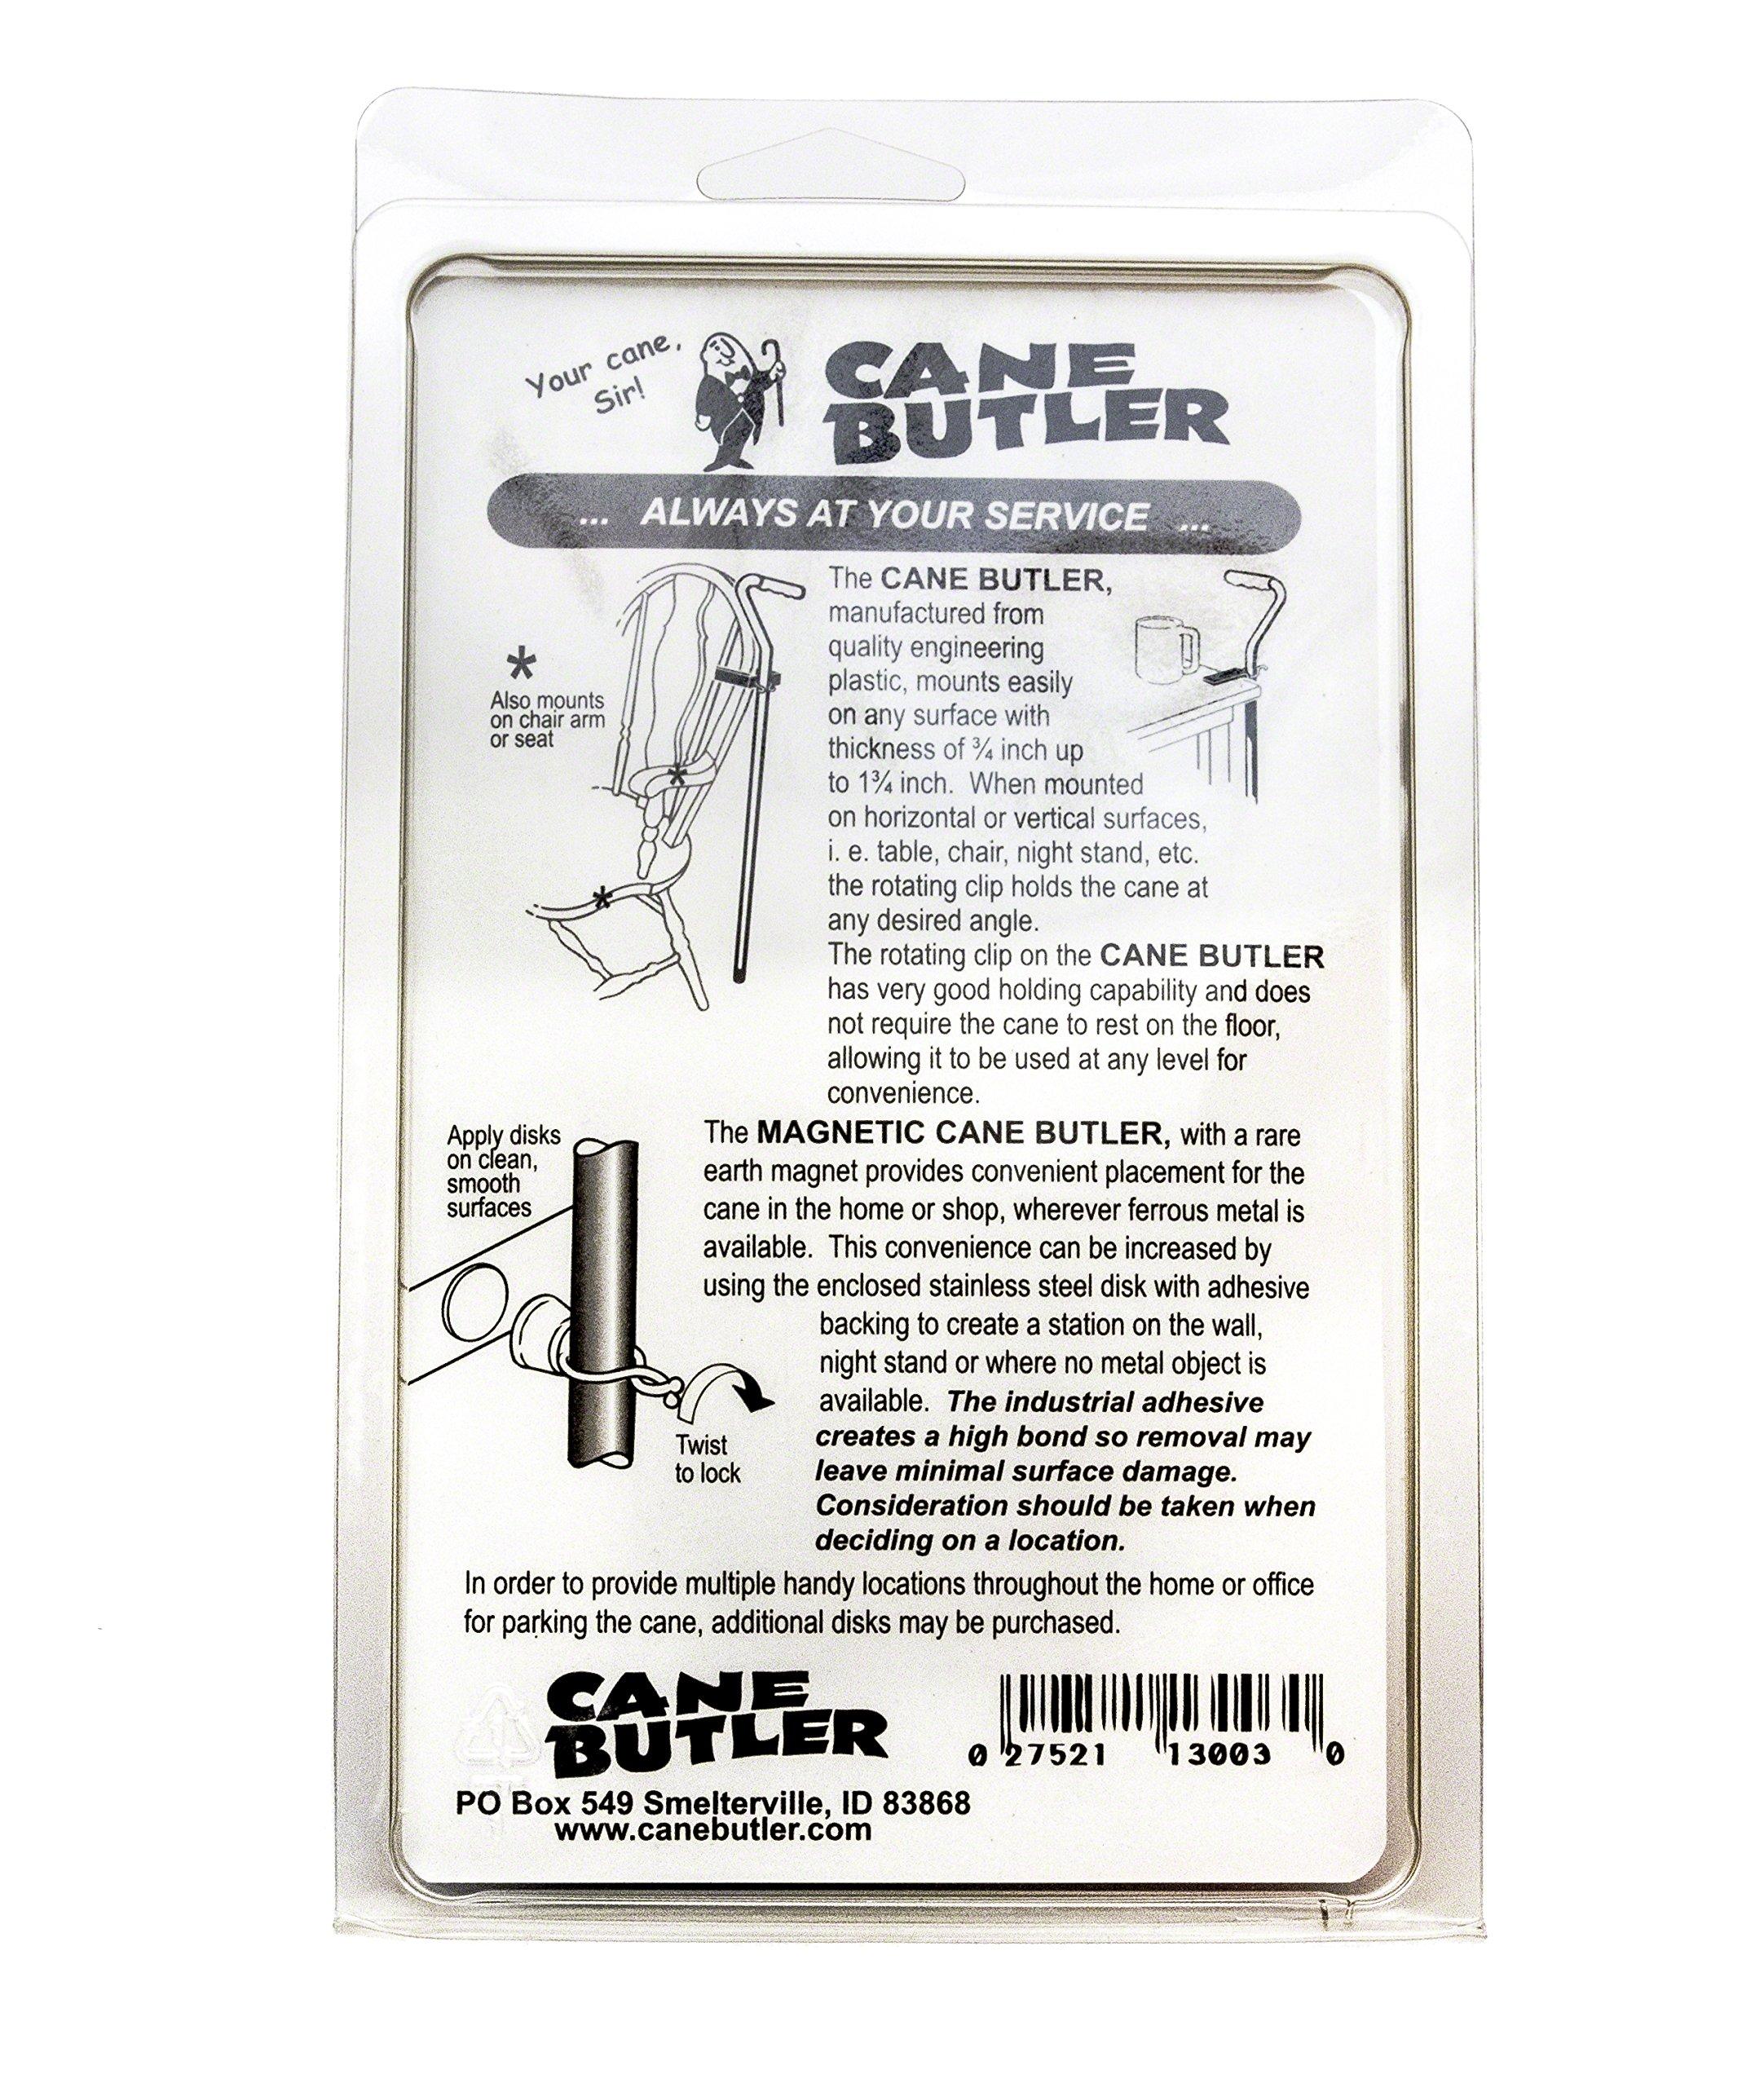 Cane Butler Combo Pack Includes Original Cane Butler, Disk Station, and Magnetic Cane Butler by Cane Butler (Image #2)